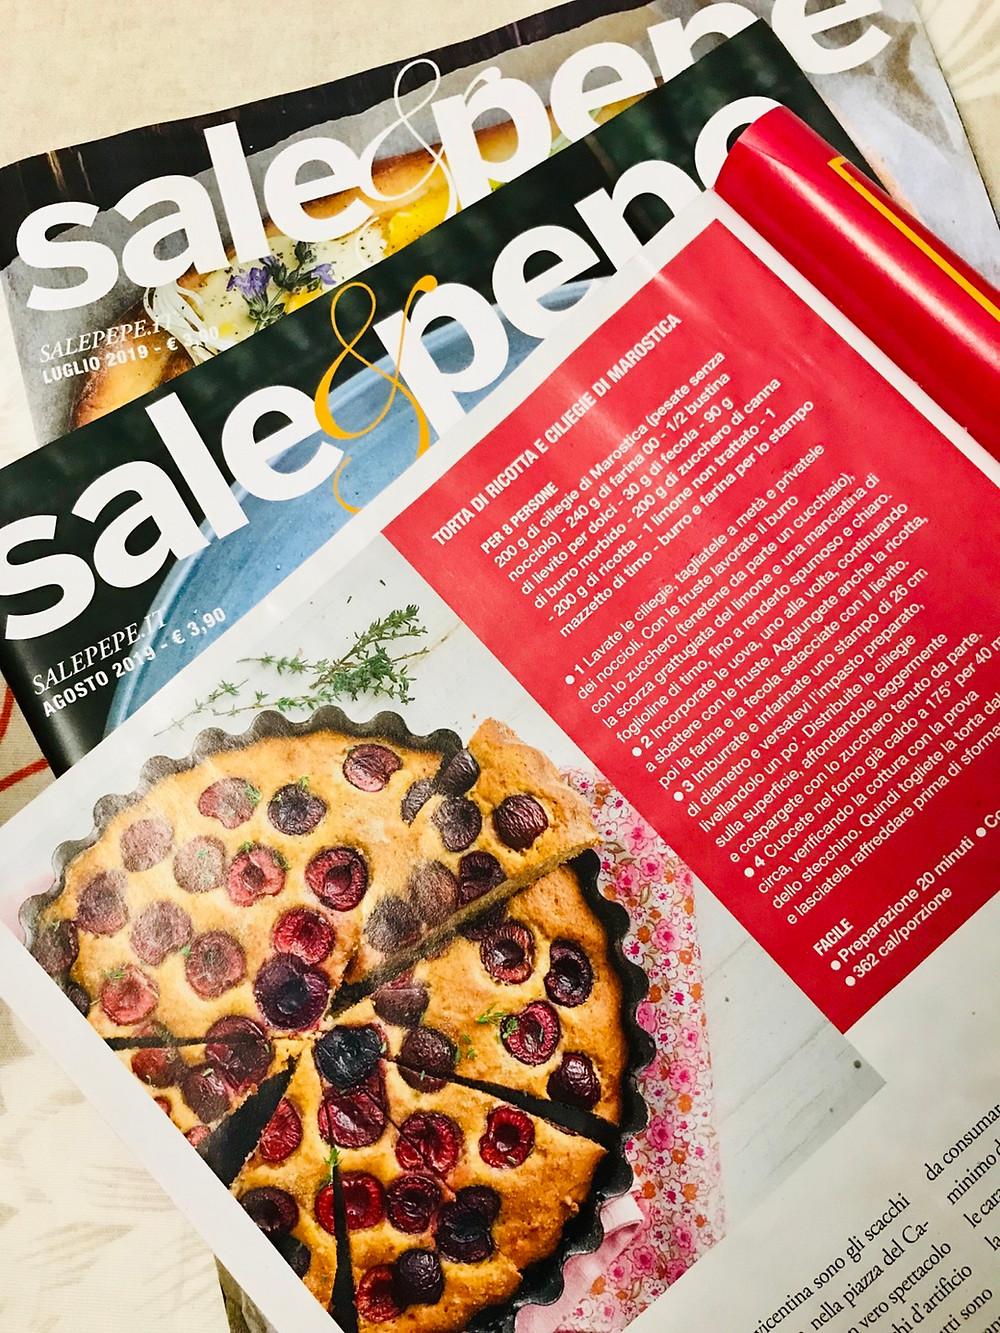 Sale&Pepe tortefelici happinessinacake